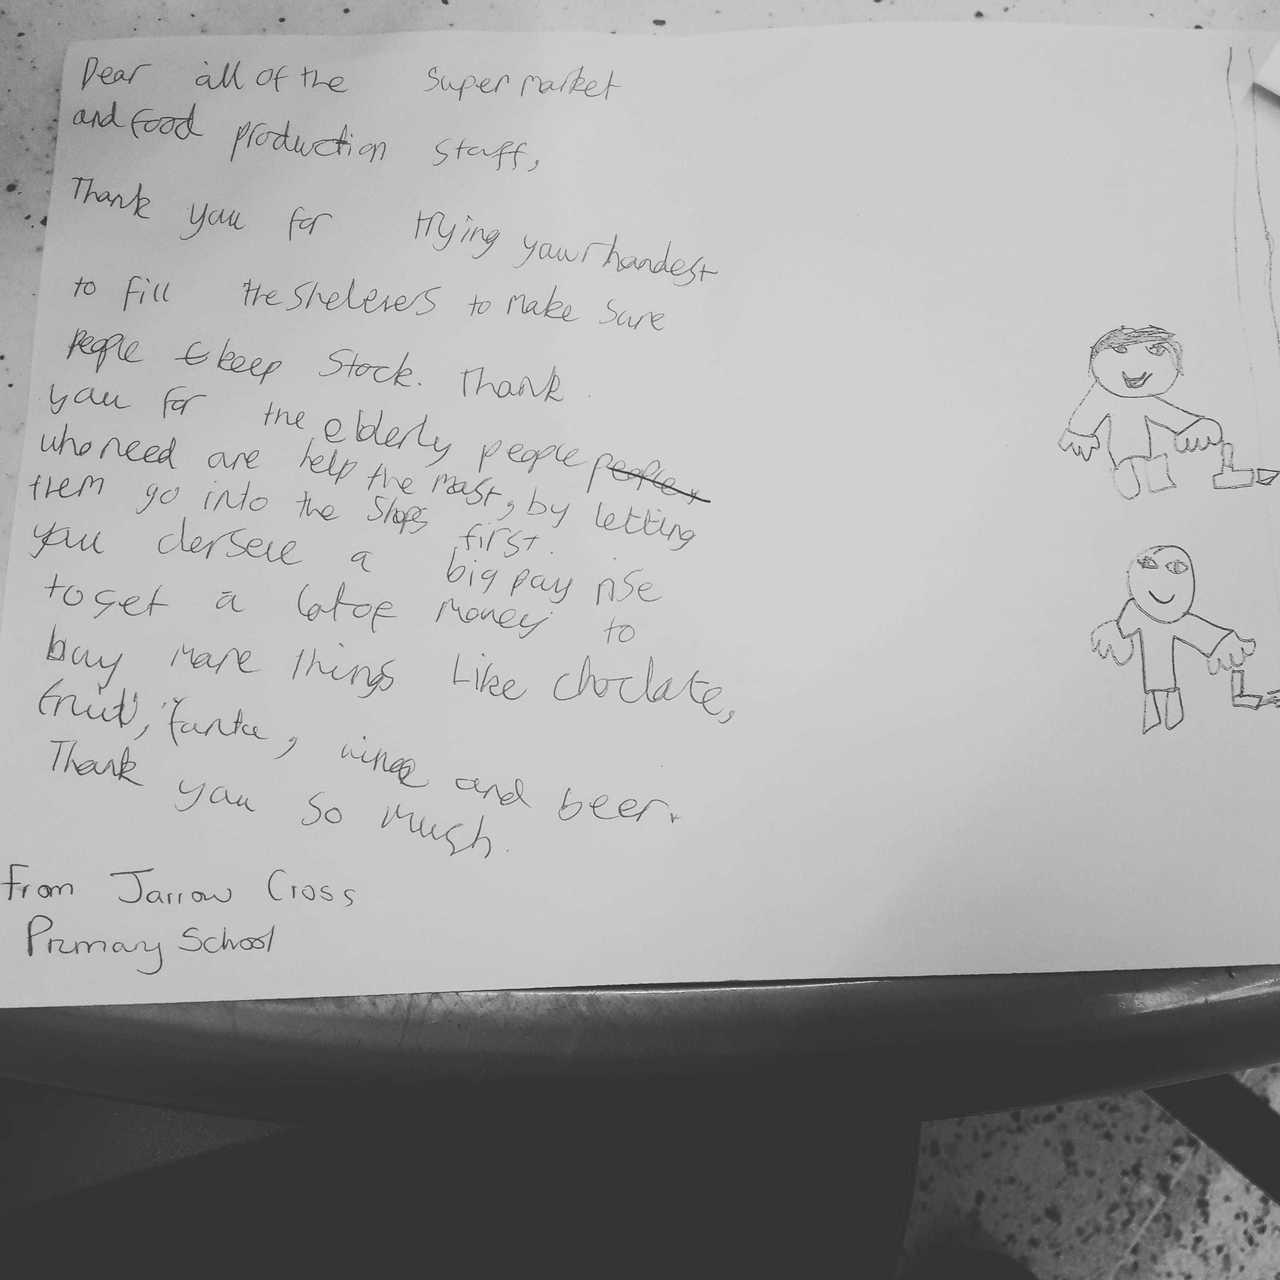 Thank you letter | Asda South Shields